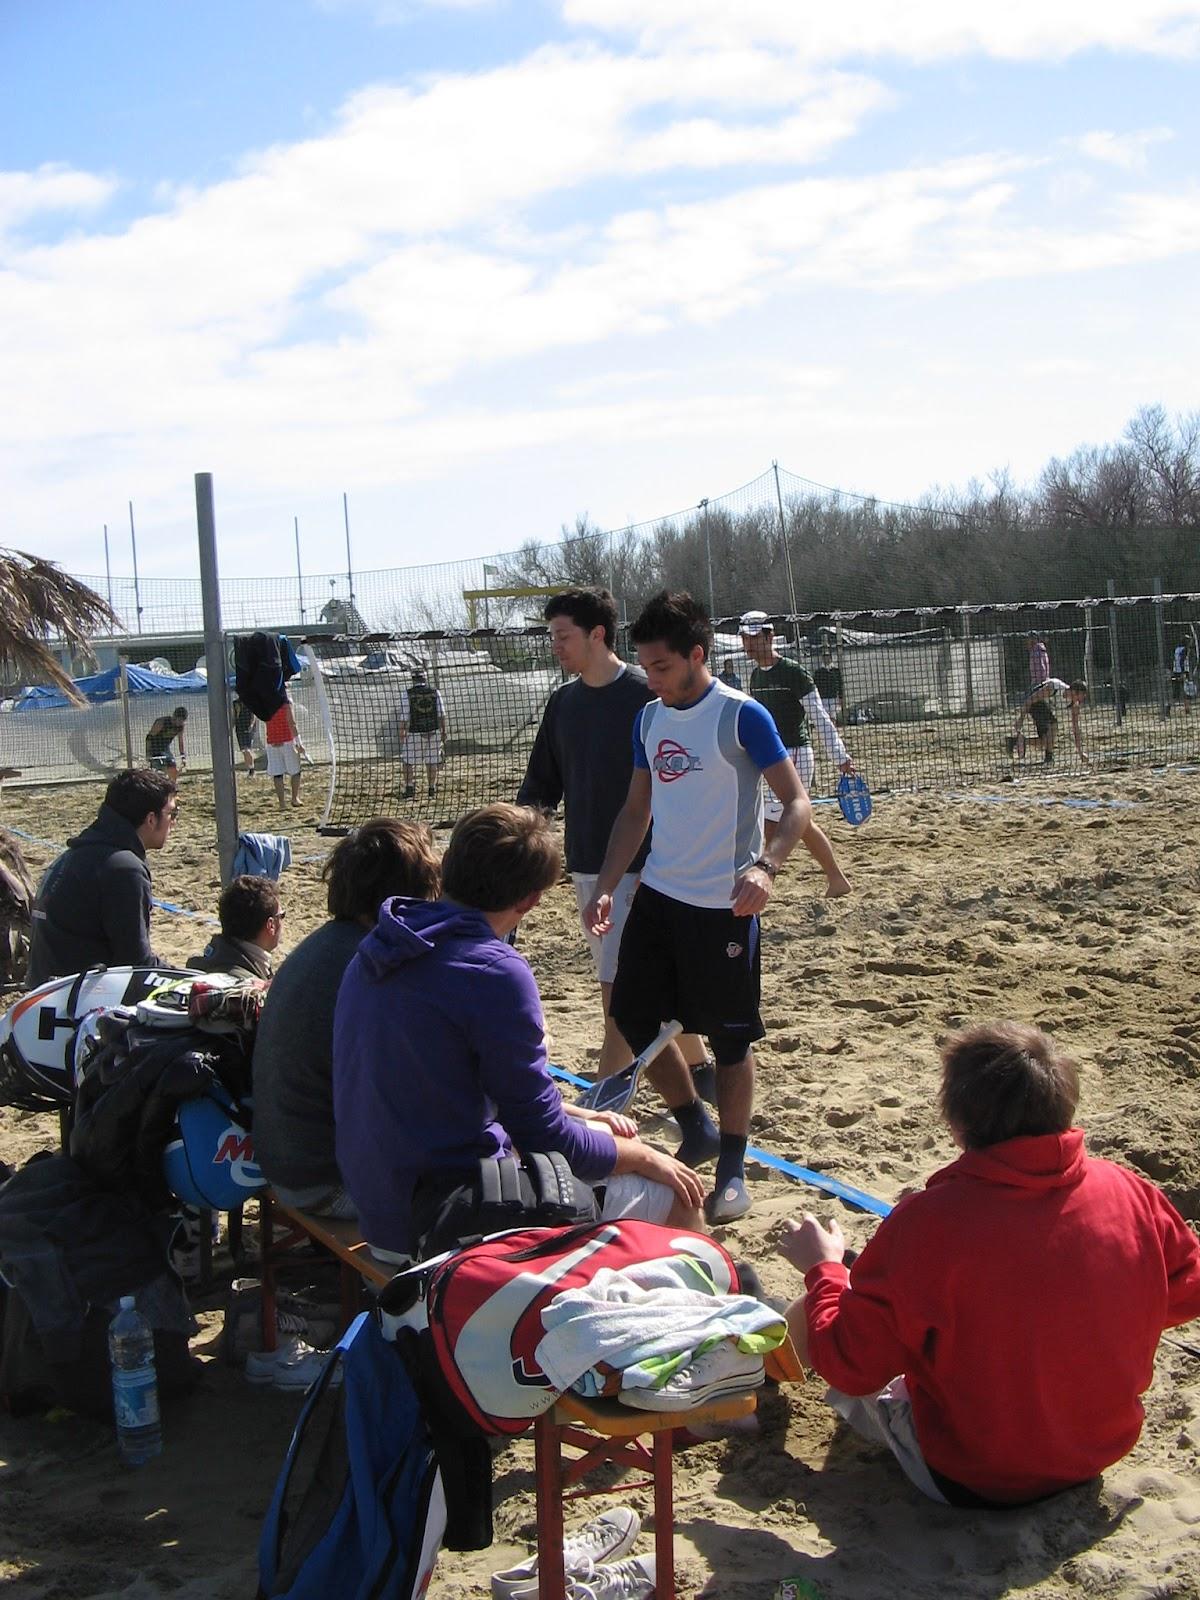 Beach Tennis Ravenna: Pasquetta al Bagno Giada, Lido Adriano ...